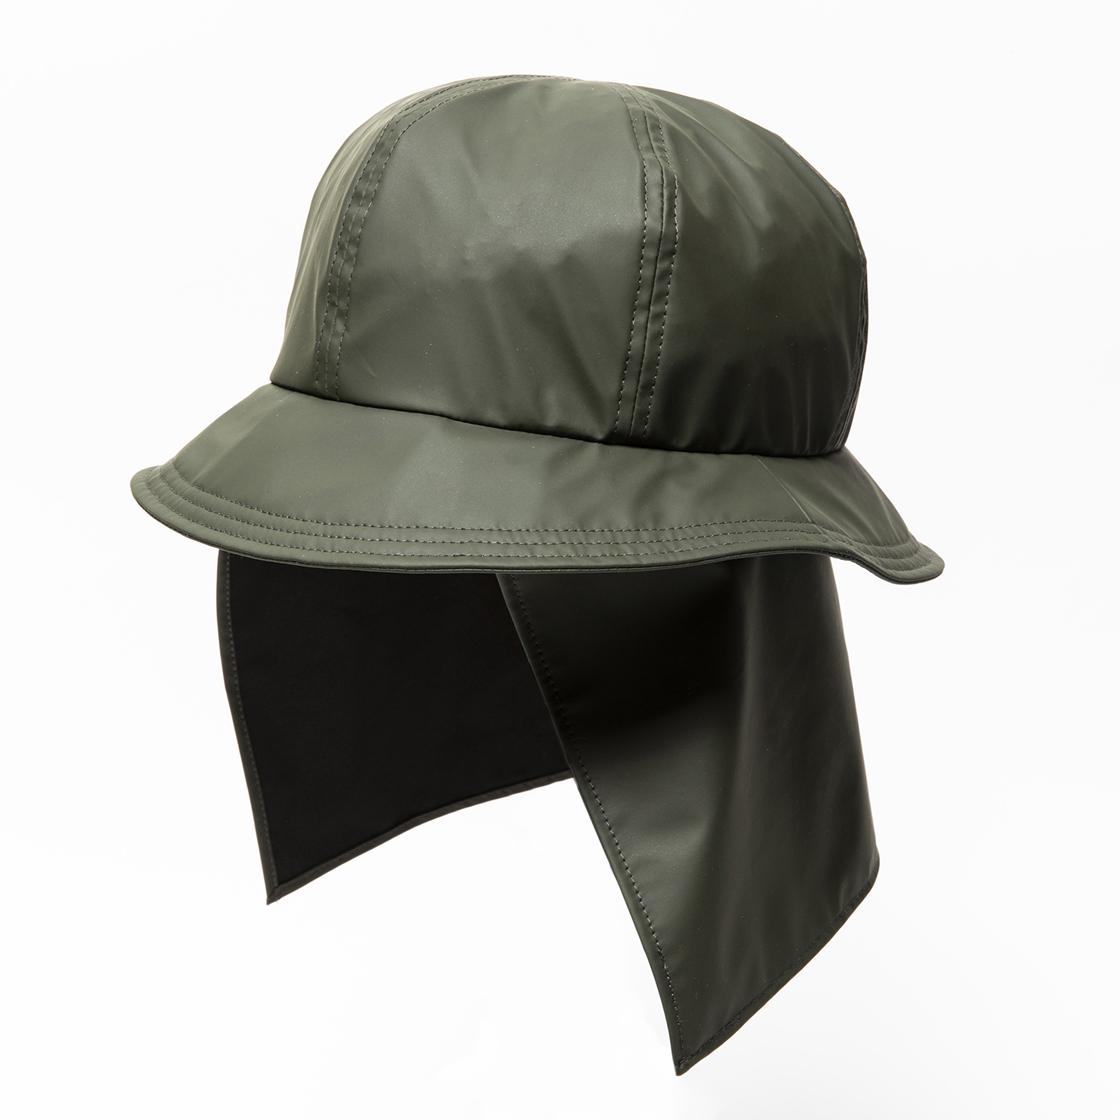 Rubber Cloth Shade Cover Coal